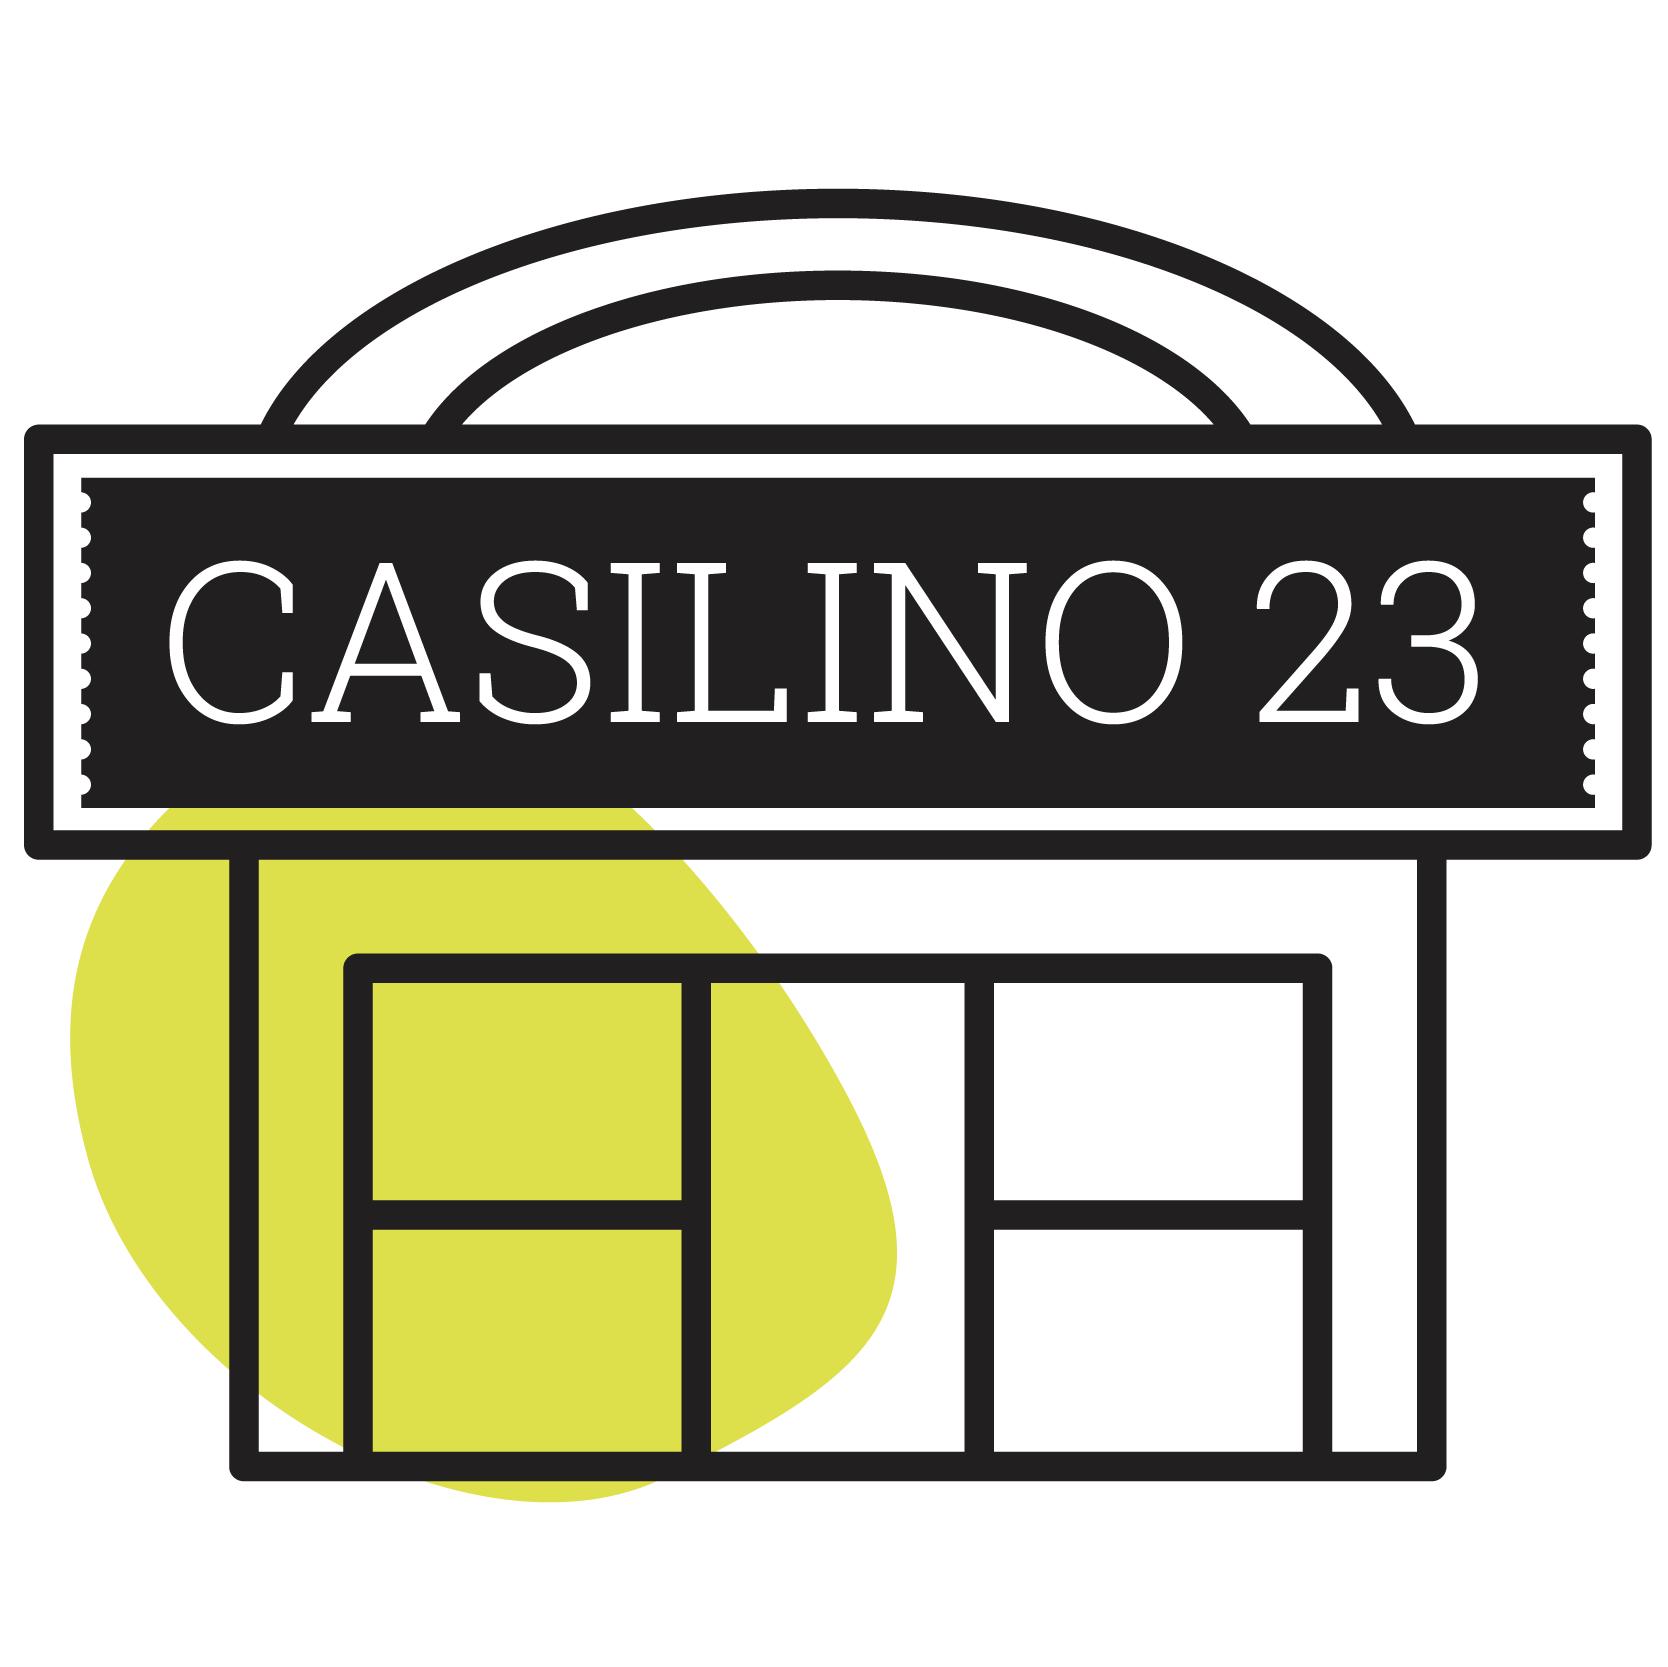 mercato casilino 23 roma